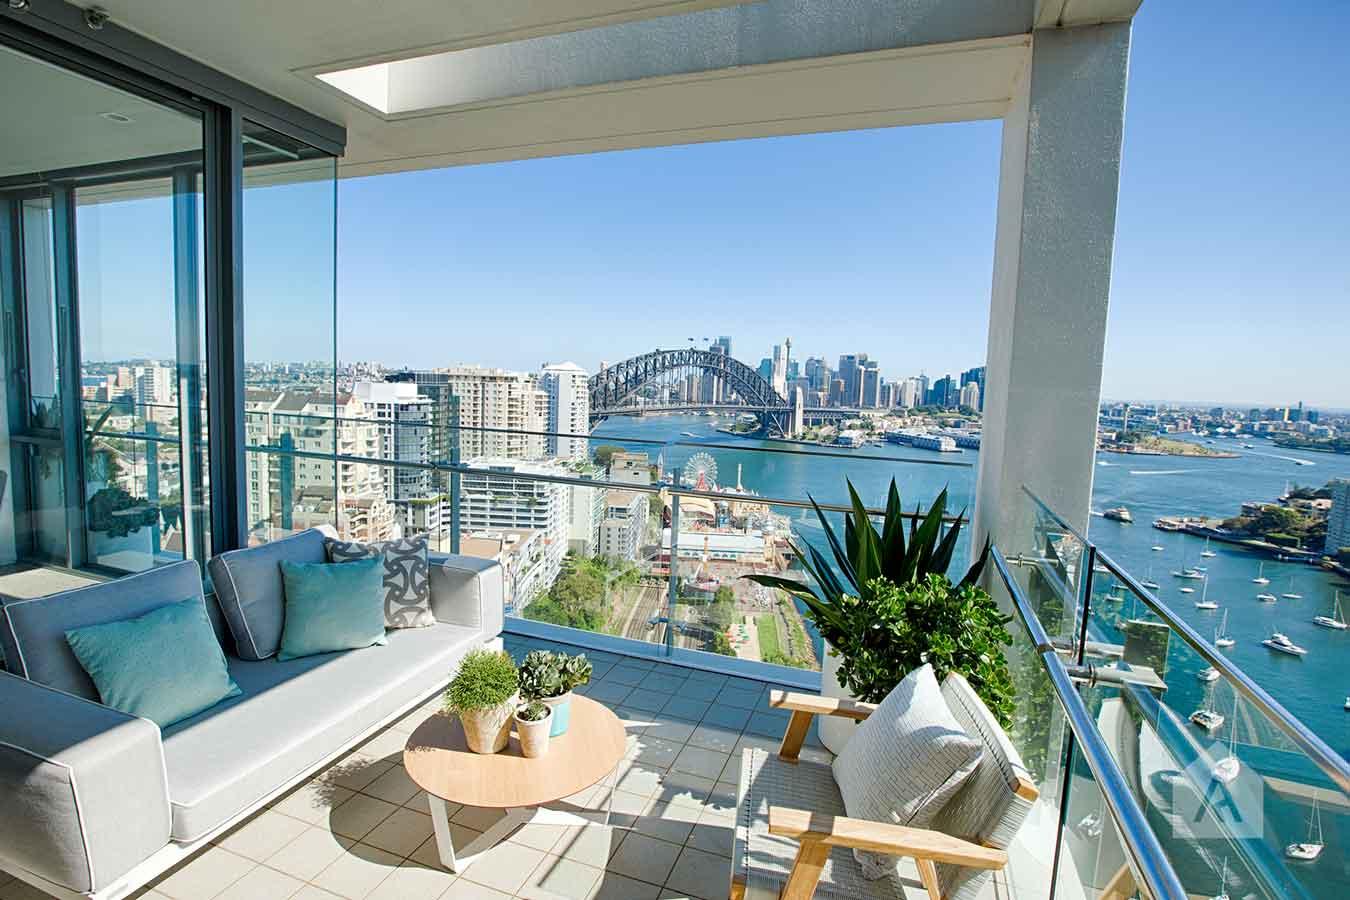 ©-Adam-Robinson-Design-Milson's-Point-Balcony-by-Chanelle-Ockenden-09.jpg